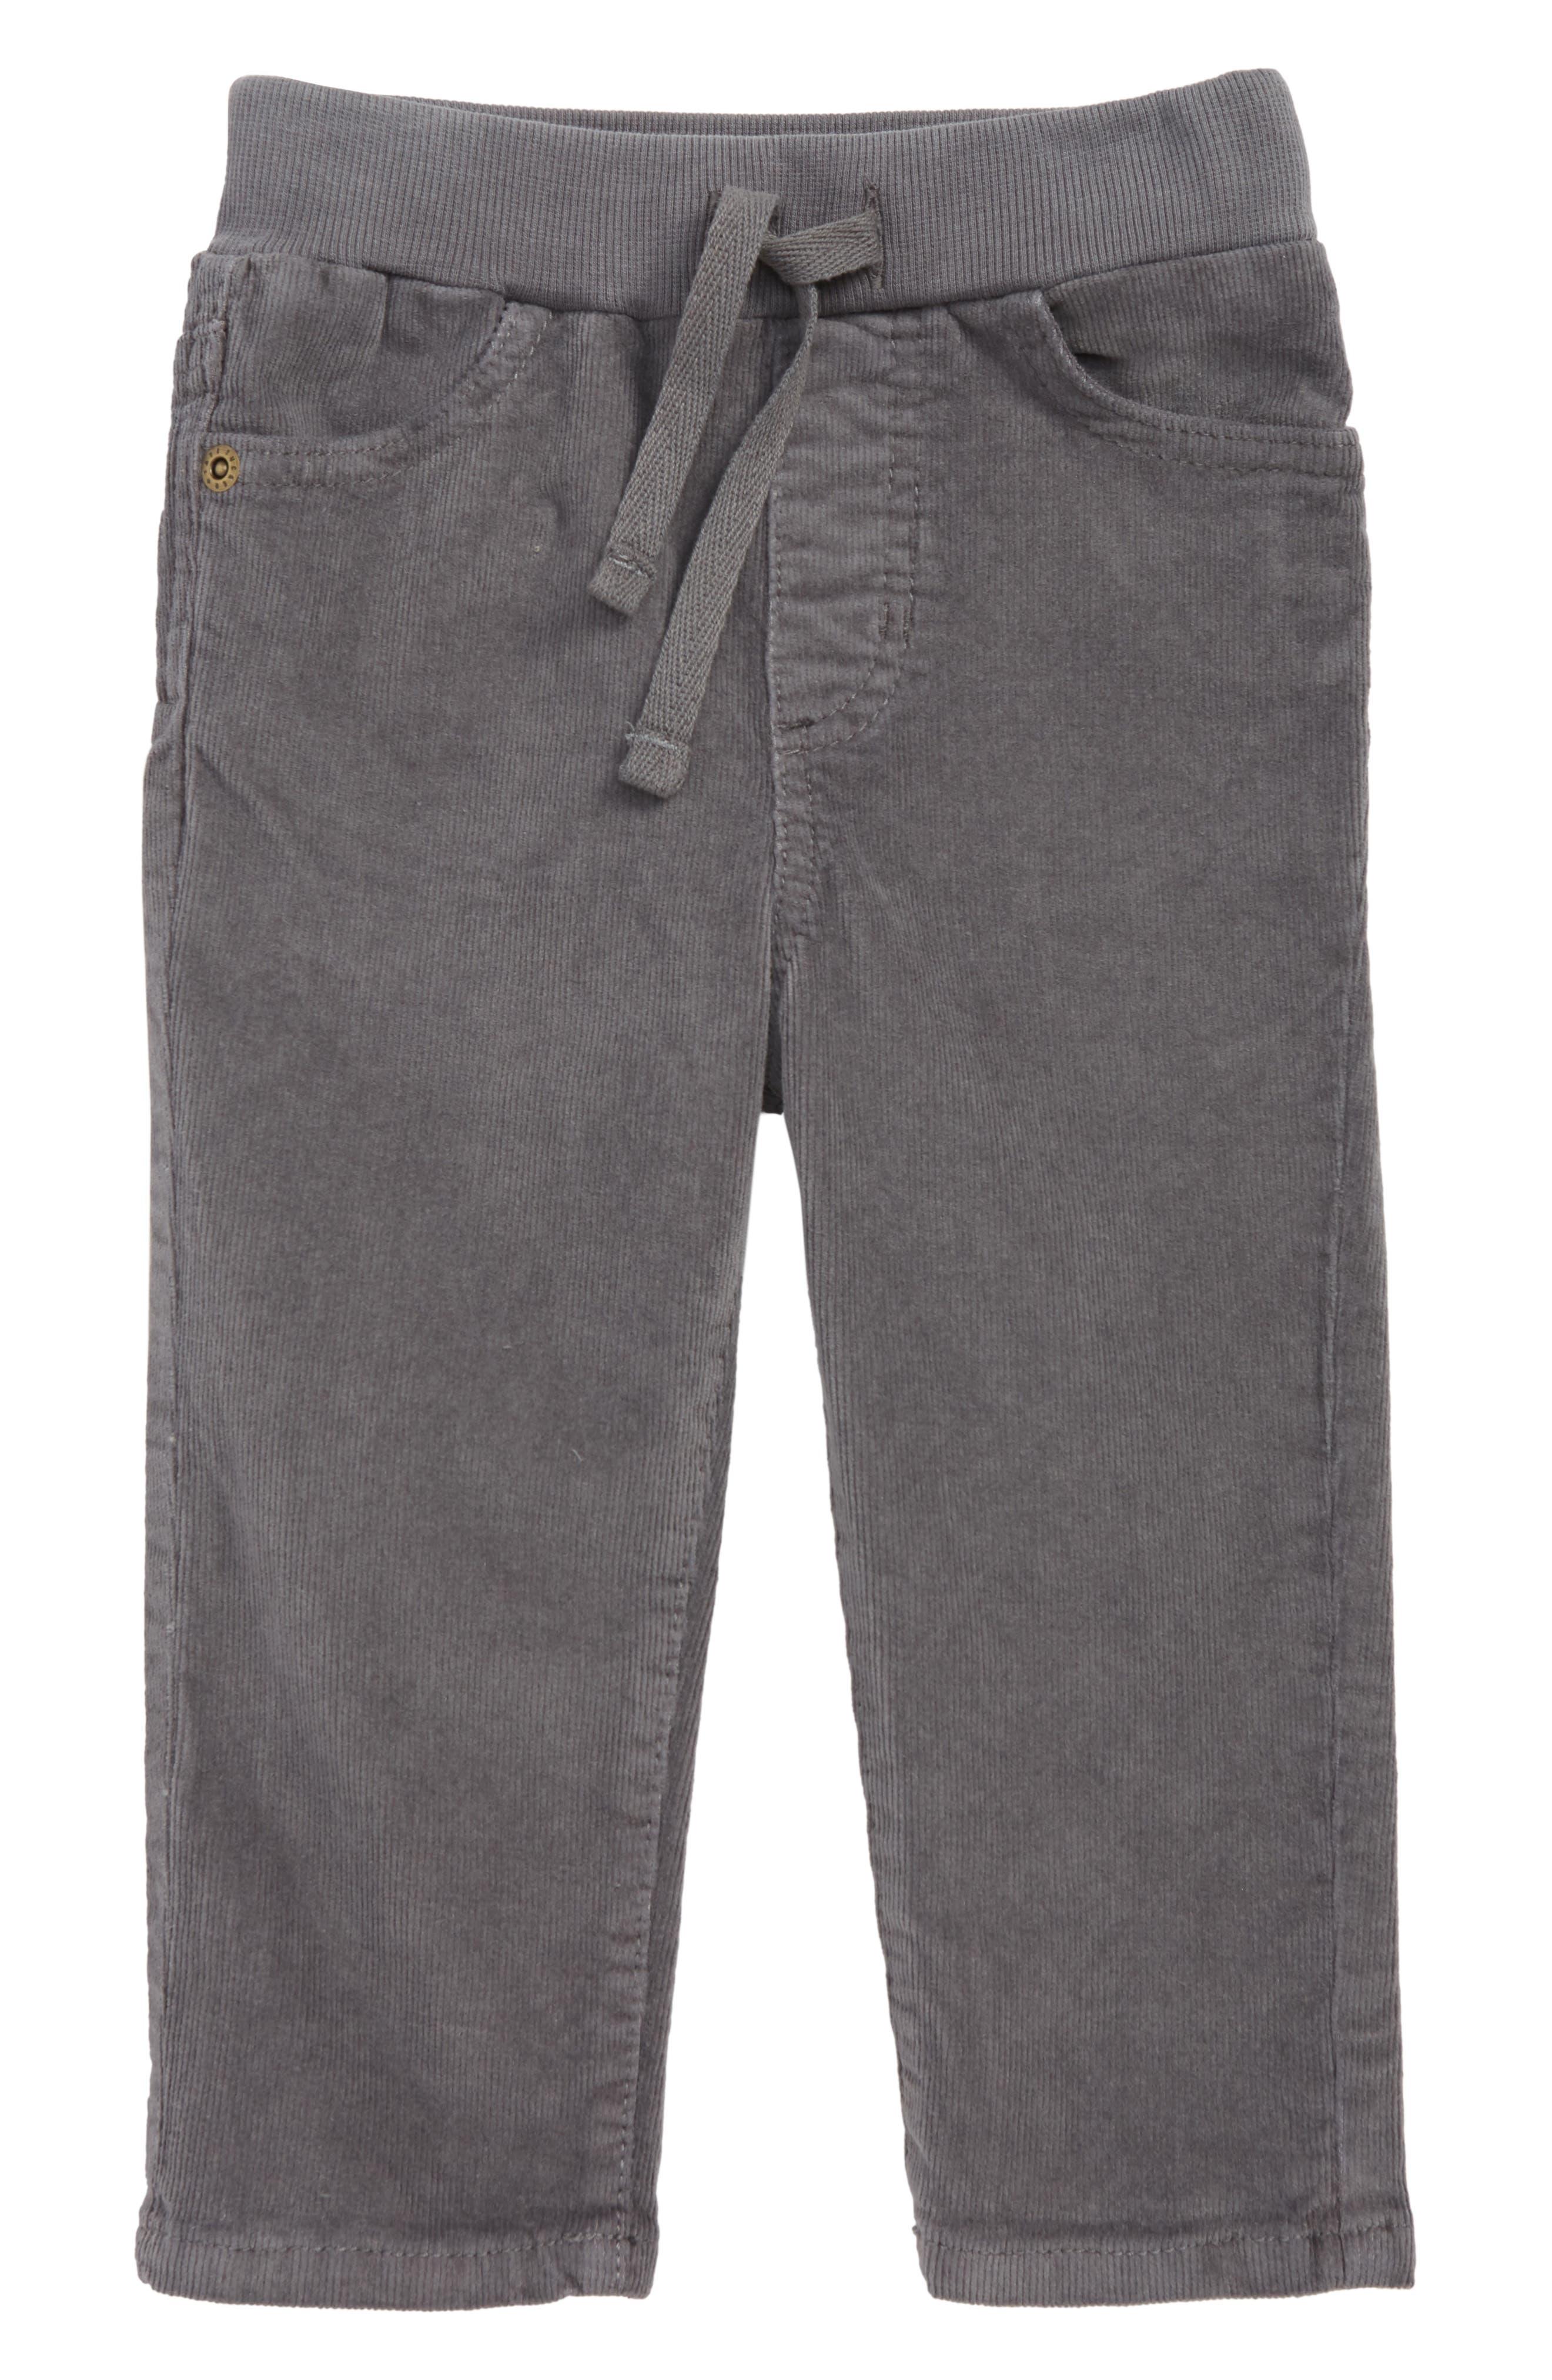 TUCKER + TATE,                             Corduroy Pants,                             Main thumbnail 1, color,                             GREY CASTLEROCK